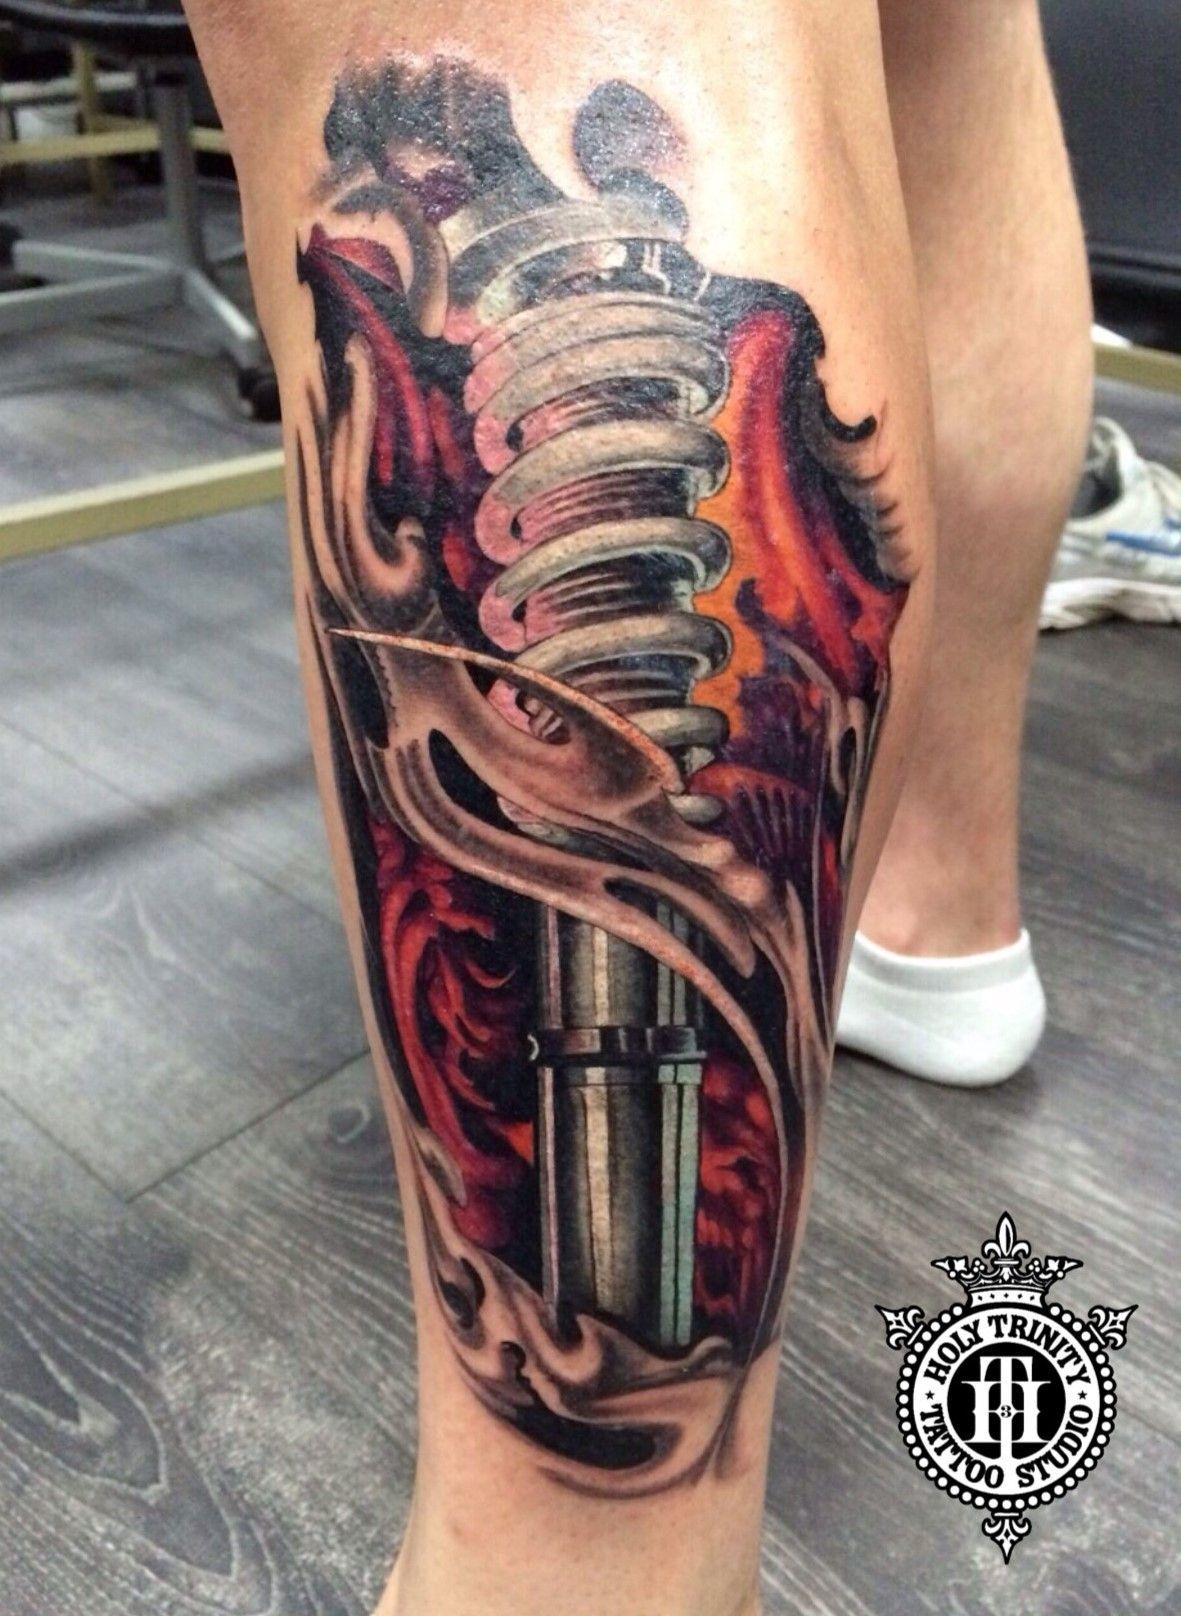 Fantastic biomechanical leg piece tattooed in the studio